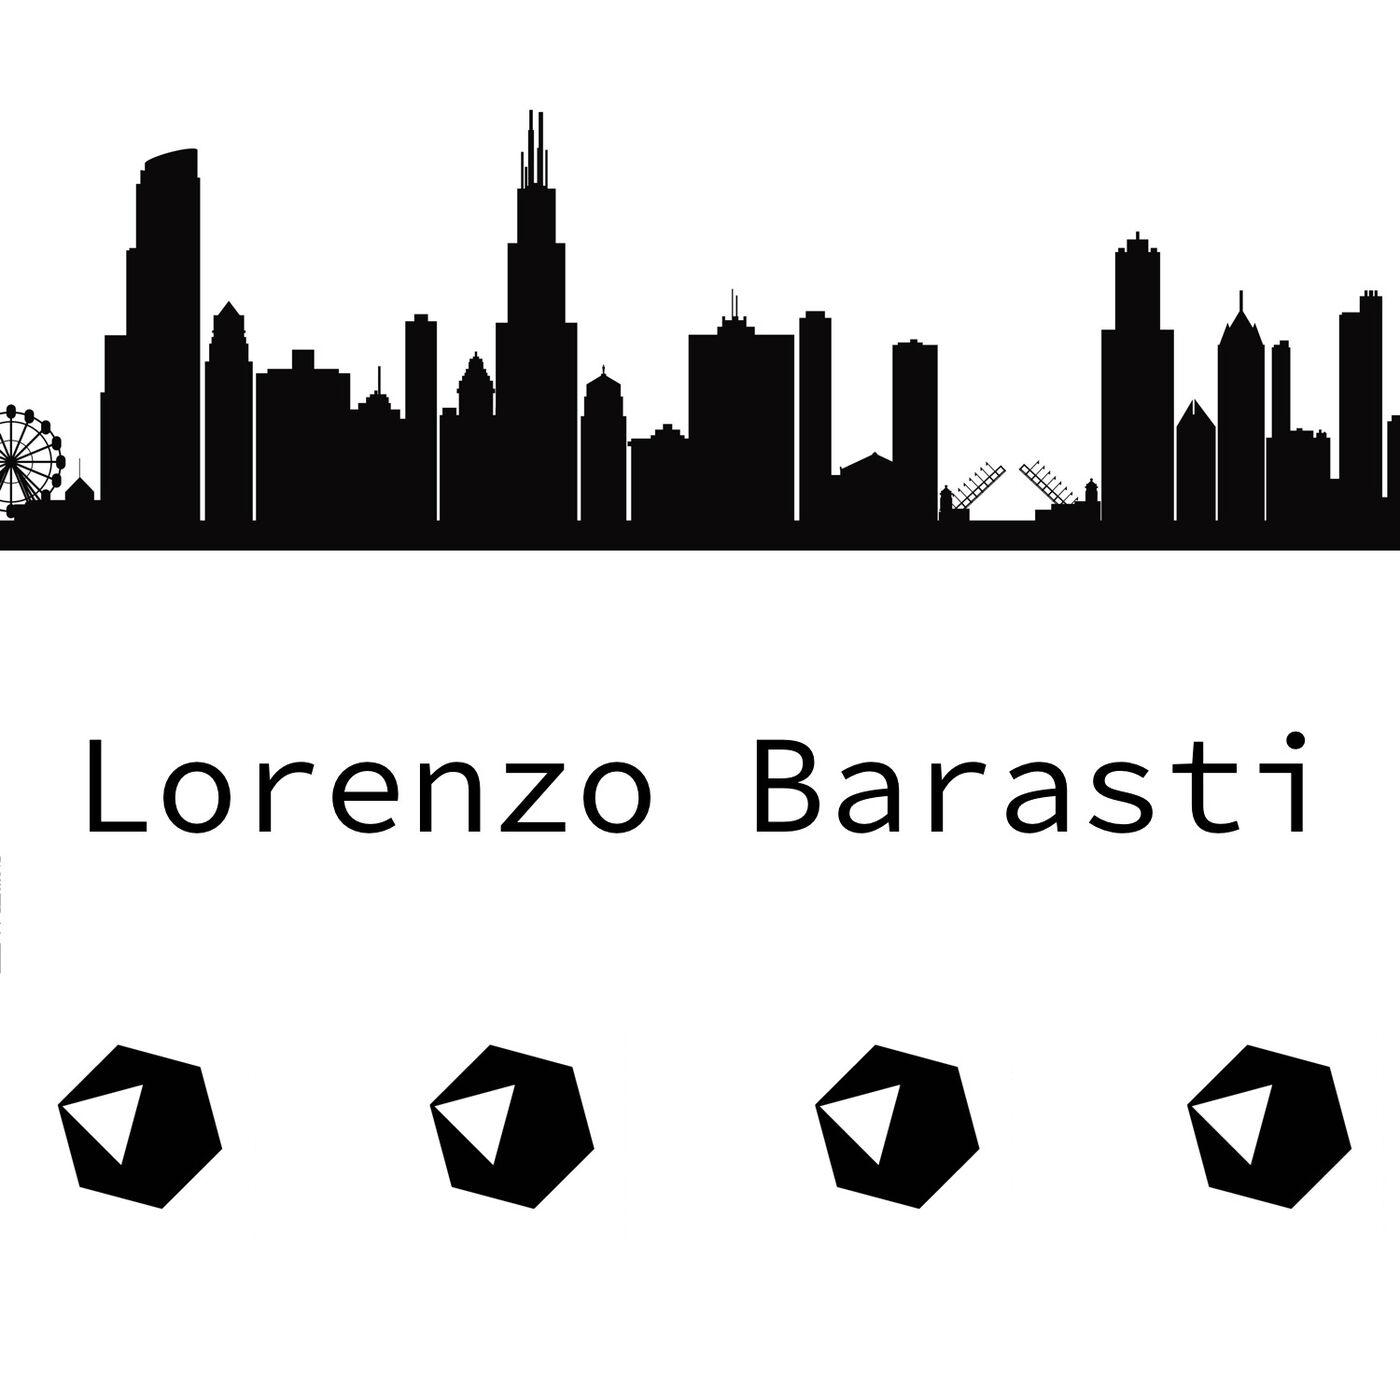 Lorenzo Barasti:  Building Crystal Community